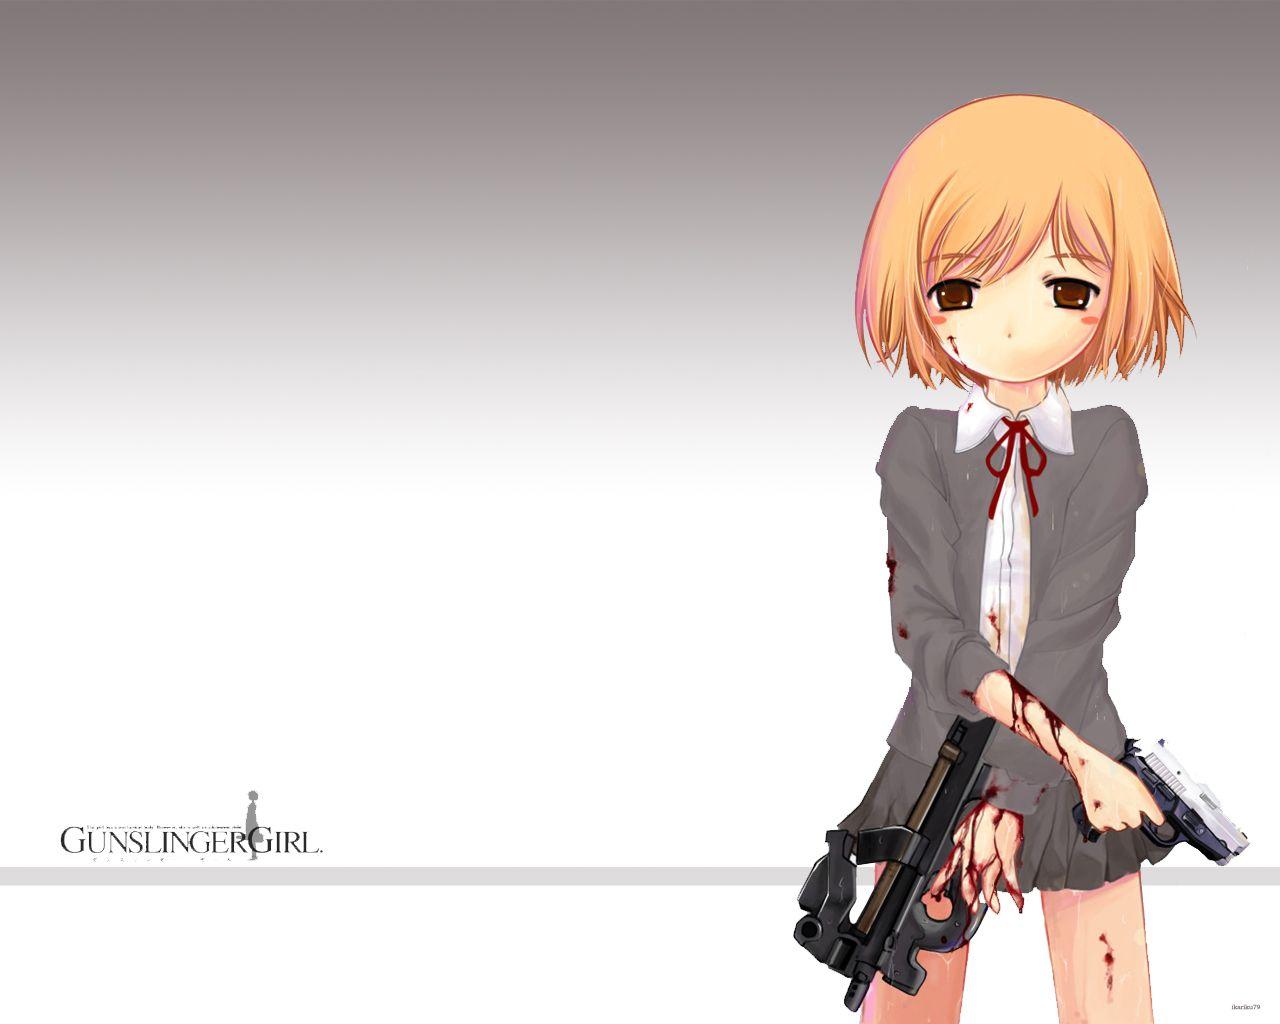 Pubg Wallpaper Boy: #Anime Girls With #guns #GSG #GunslingerGirl #P90 Http